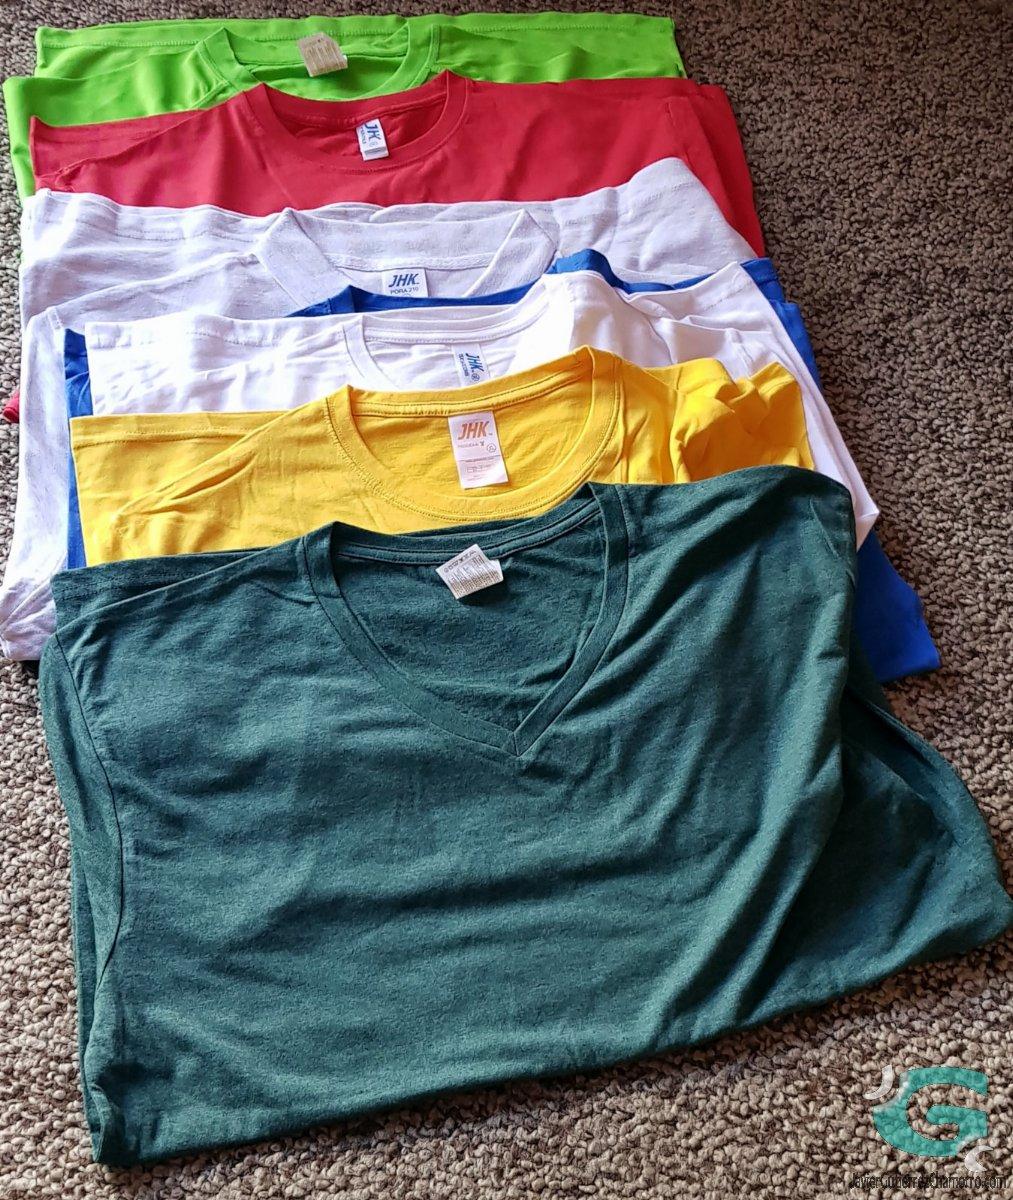 JHK T-Shirt